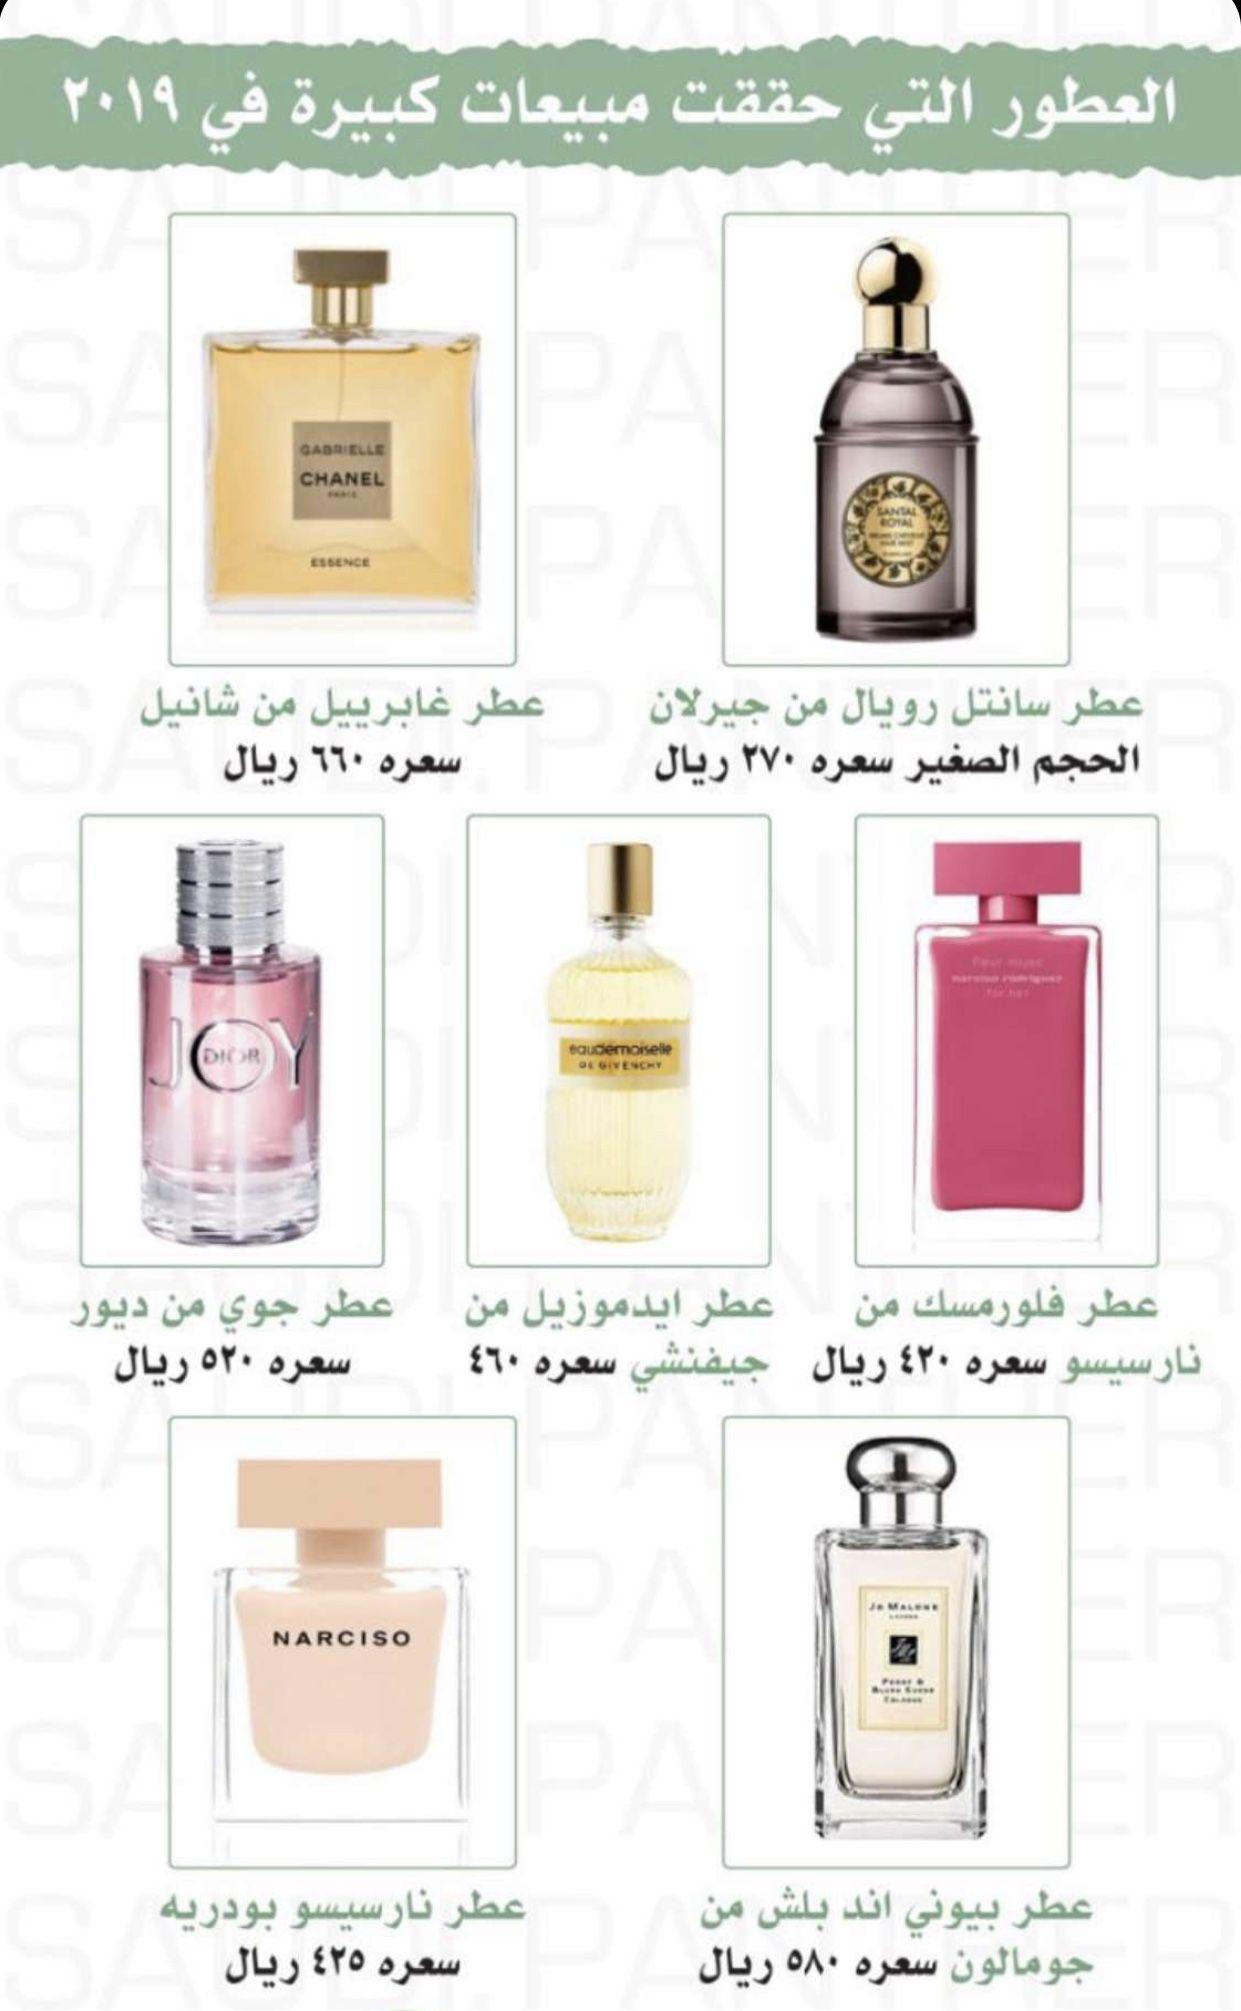 Pin By Re0o0ry ه م س ات ع اب ر ة On Informations معلومات Perfume Scents Beauty Perfume Lovely Perfume